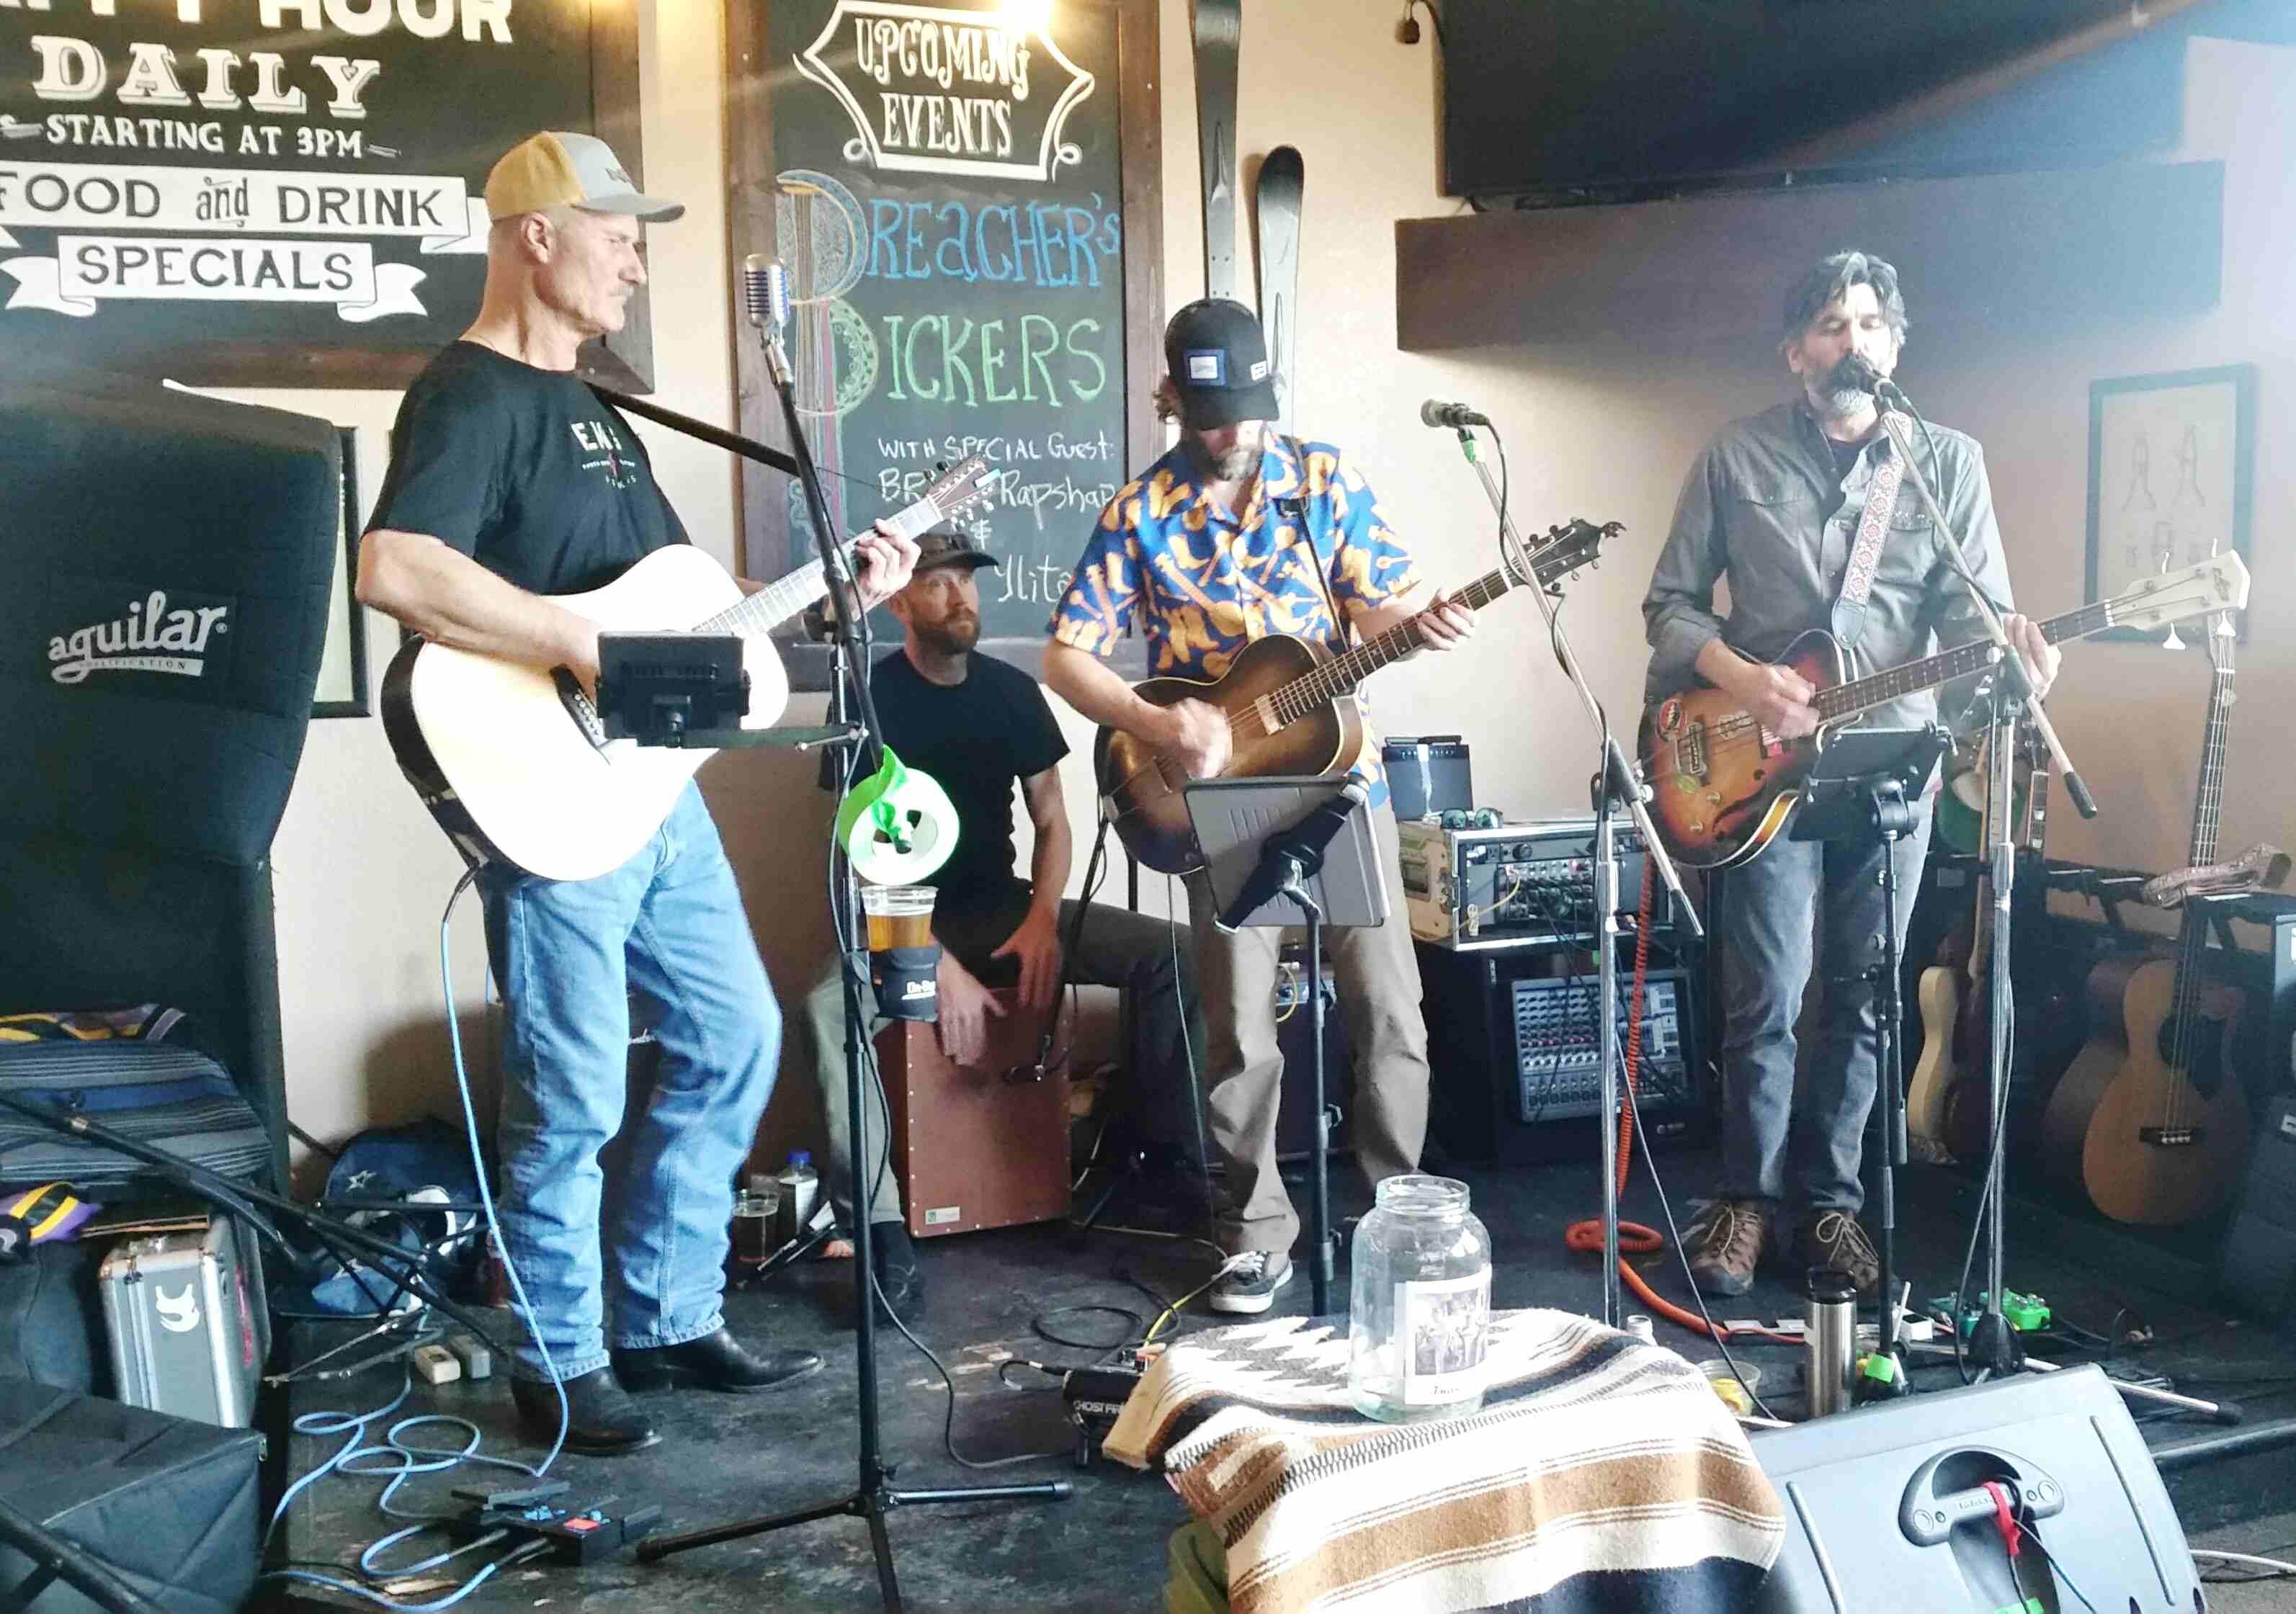 Preacher Pickers Band